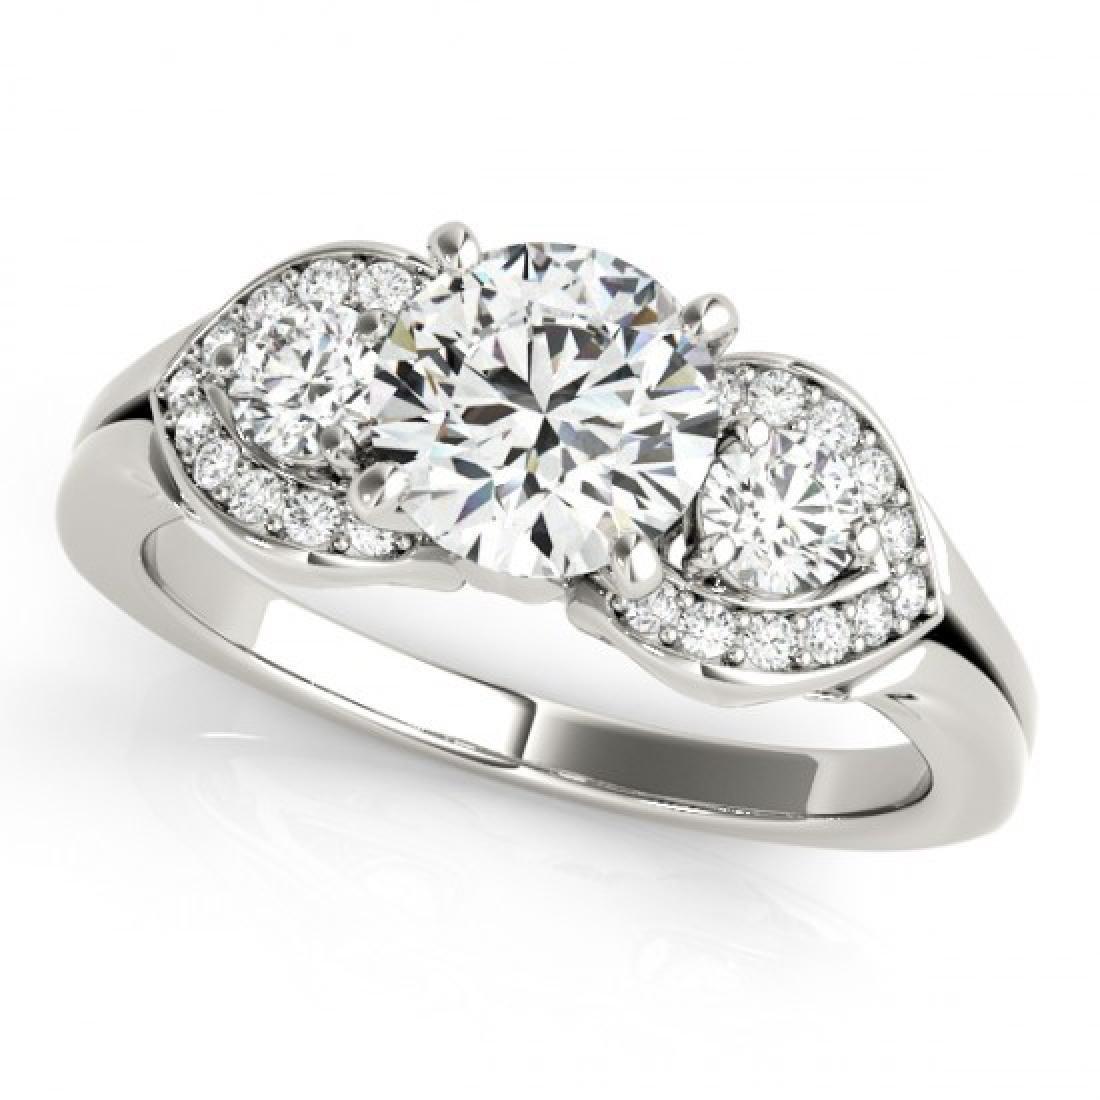 1.45 CTW Certified VS/SI Diamond 3 Stone Ring 14K White